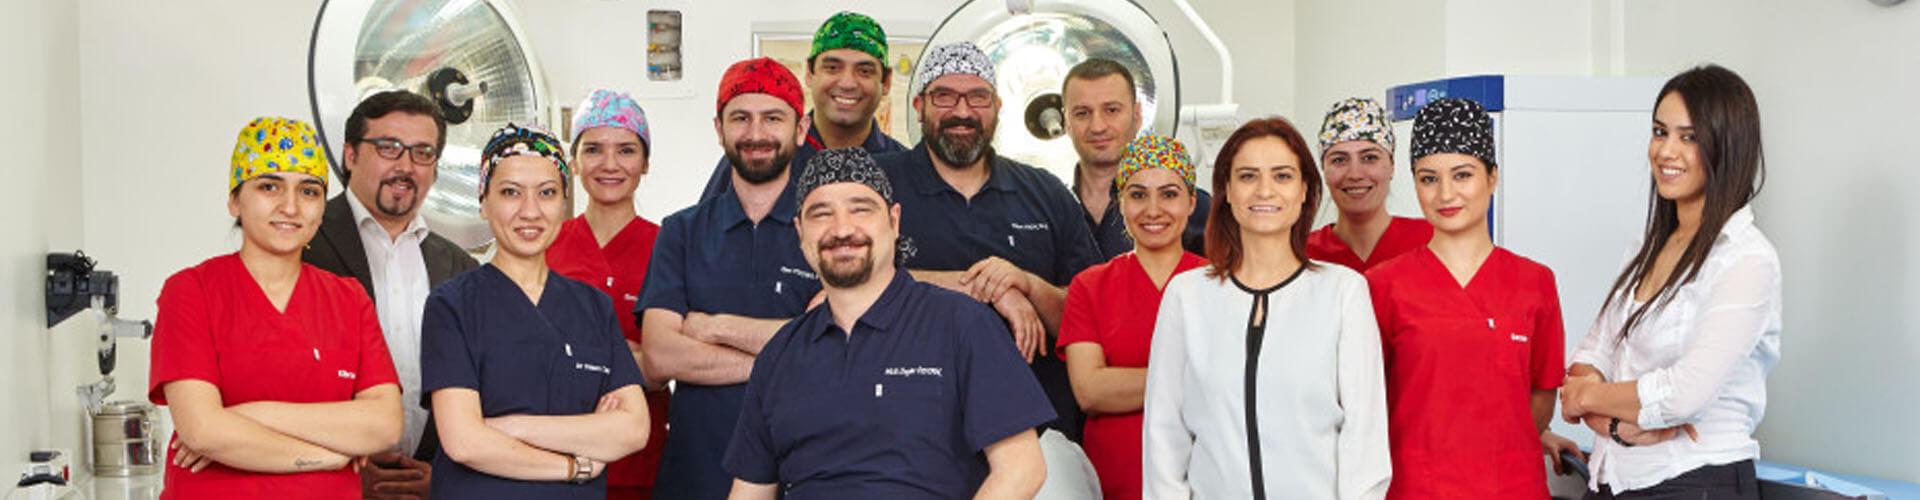 Команда клиники HLC в Анкаре